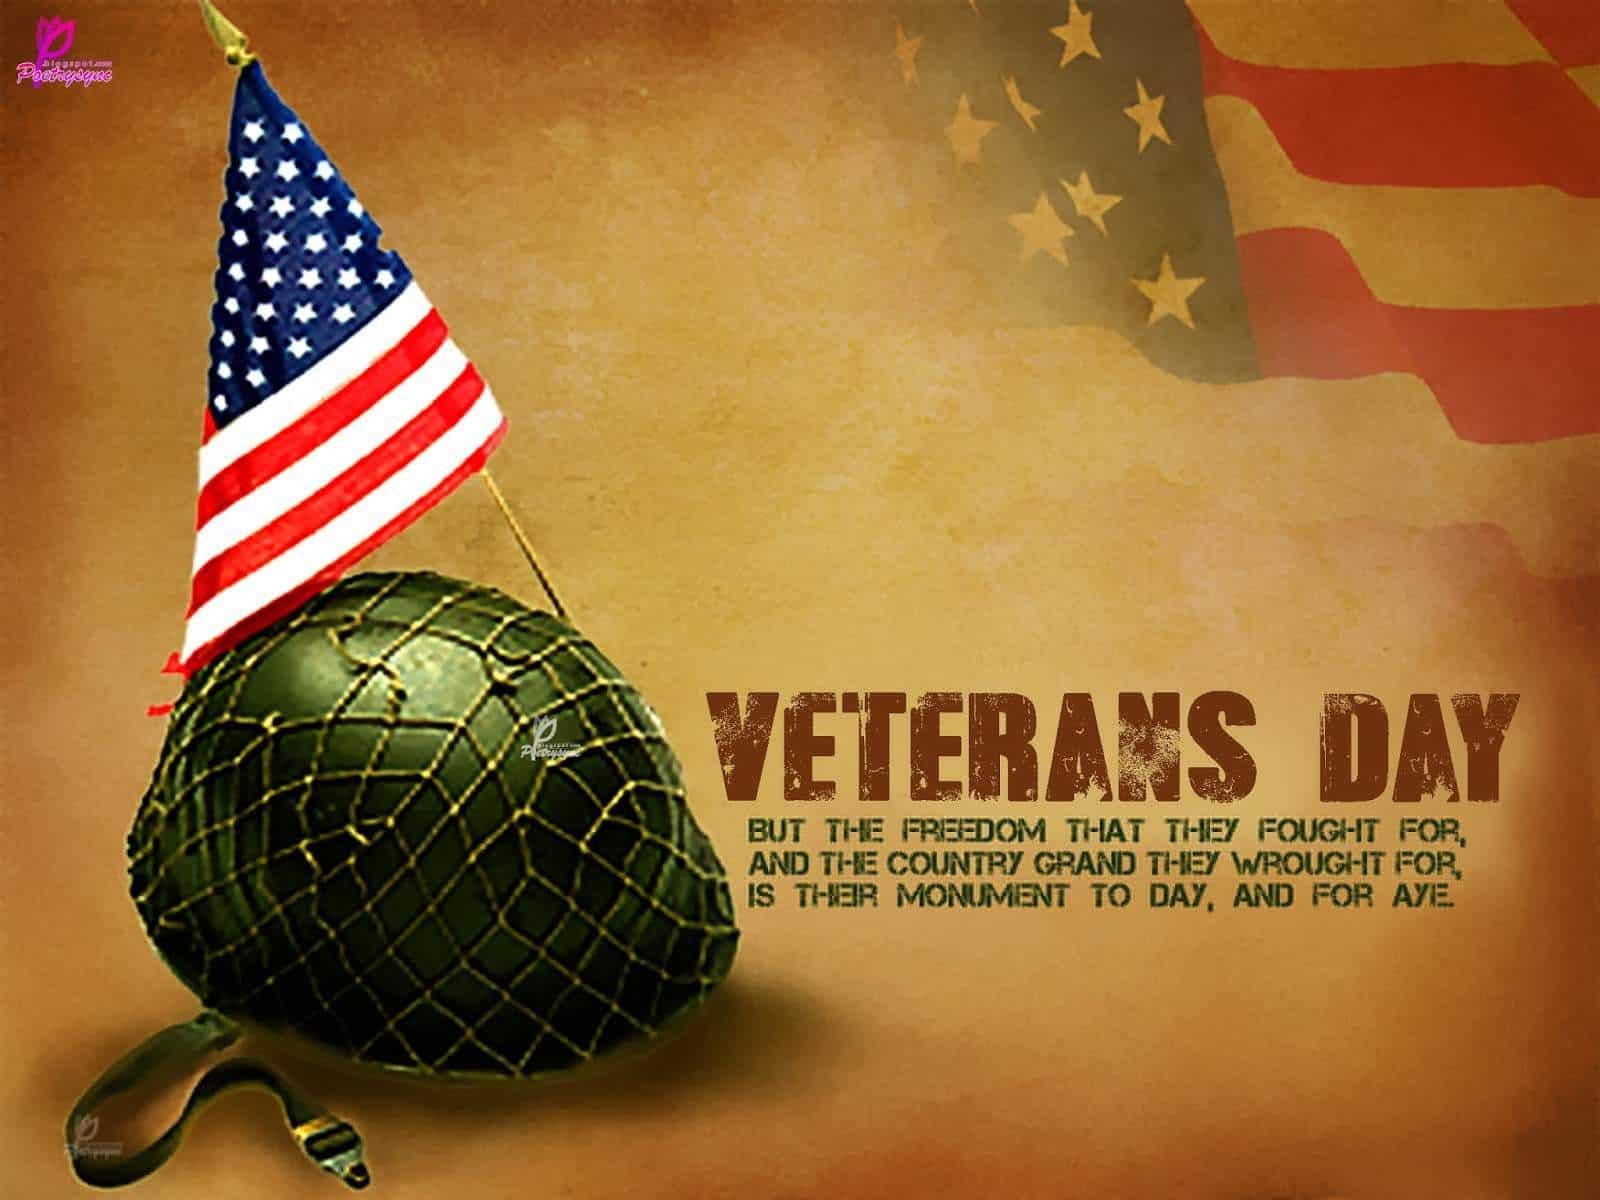 veterans day quotes 26